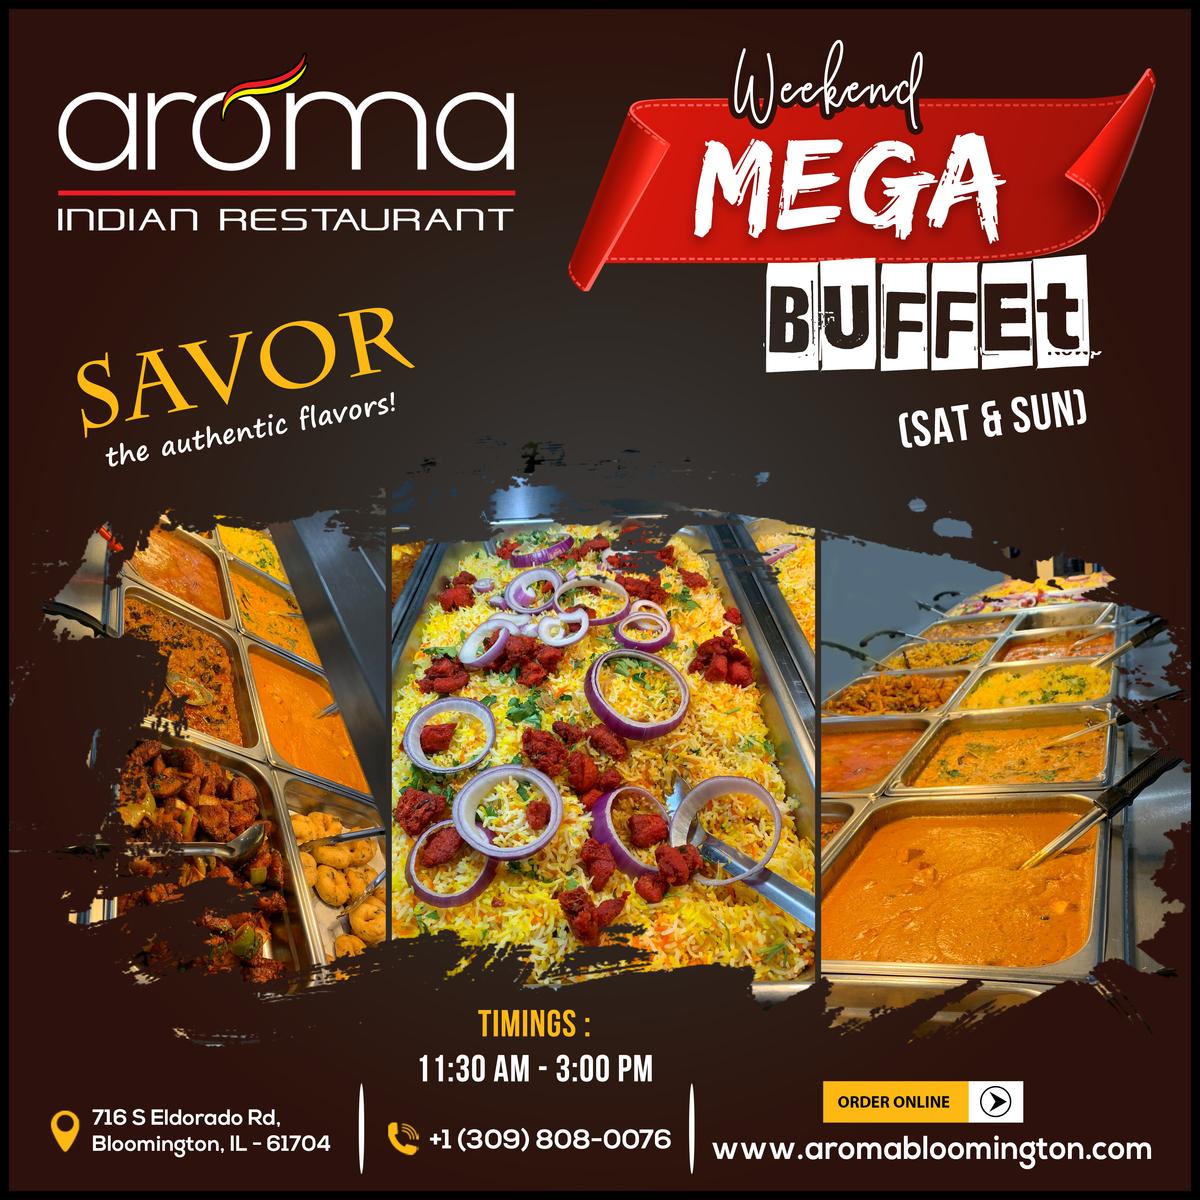 Weekend Special Mega Buffet